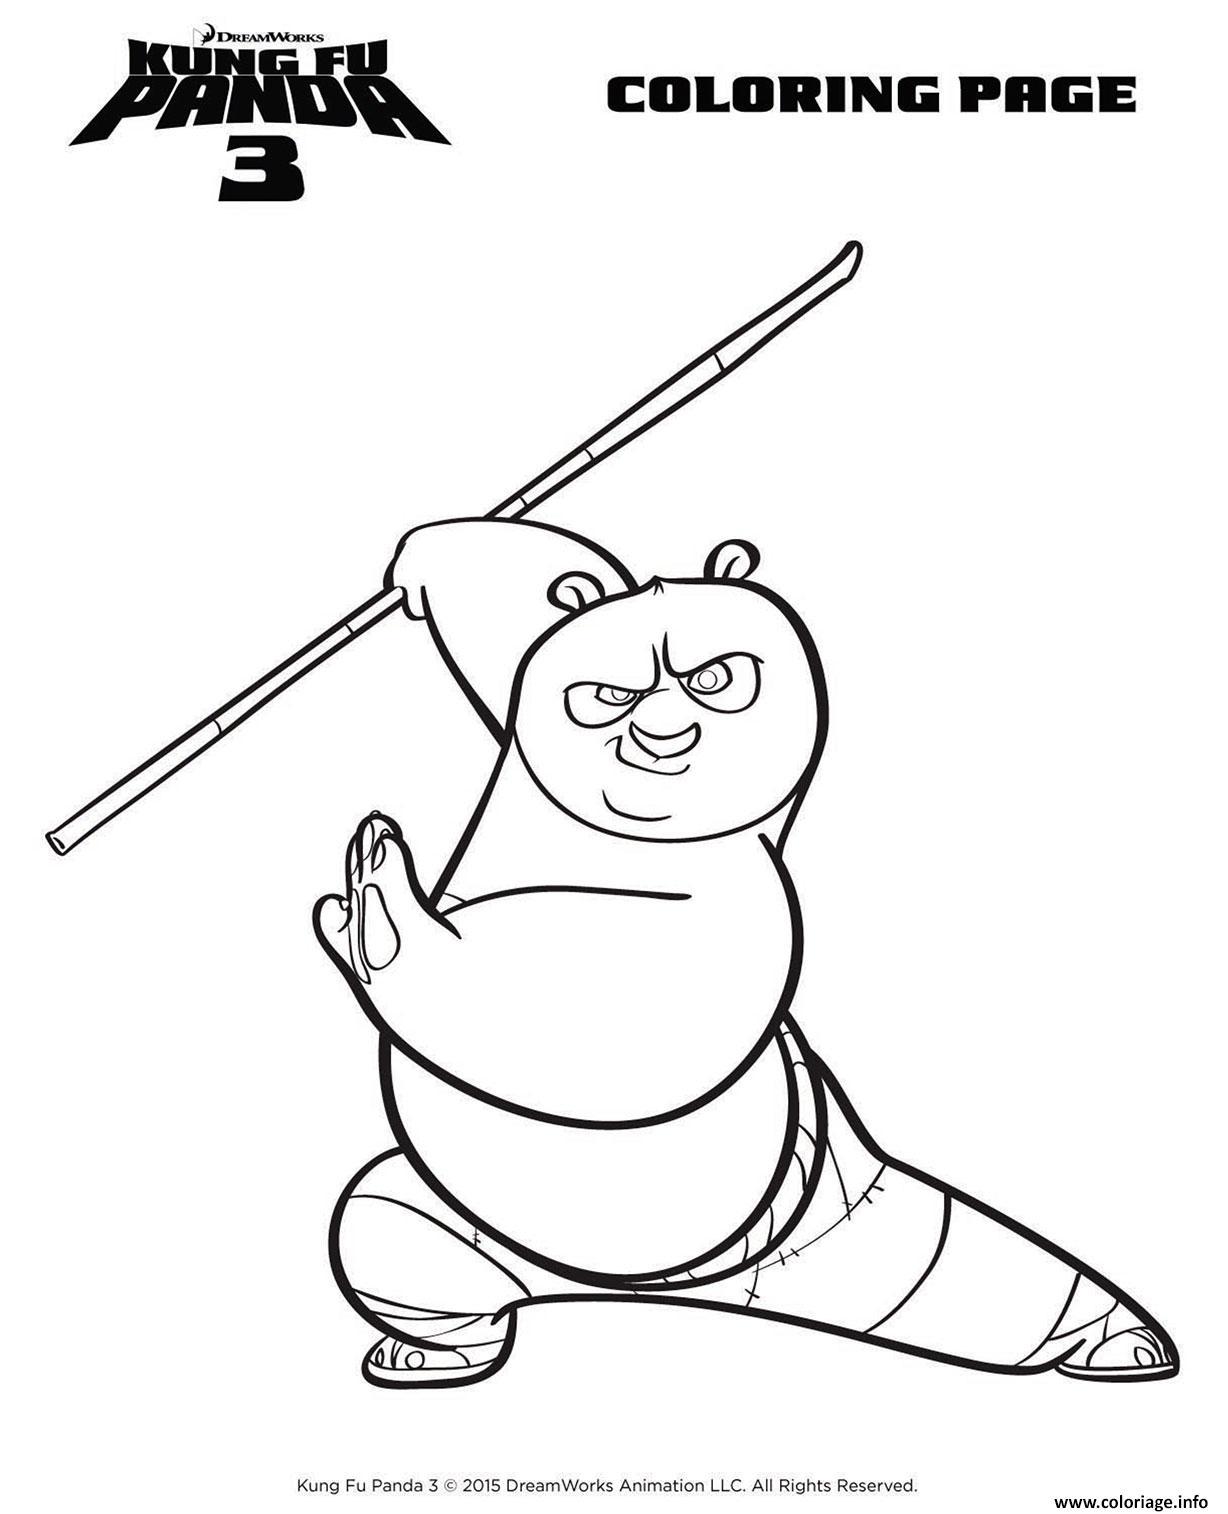 Coloriage kung fu panda 3 po 2016 dessin - Kung fu panda 3 telecharger ...